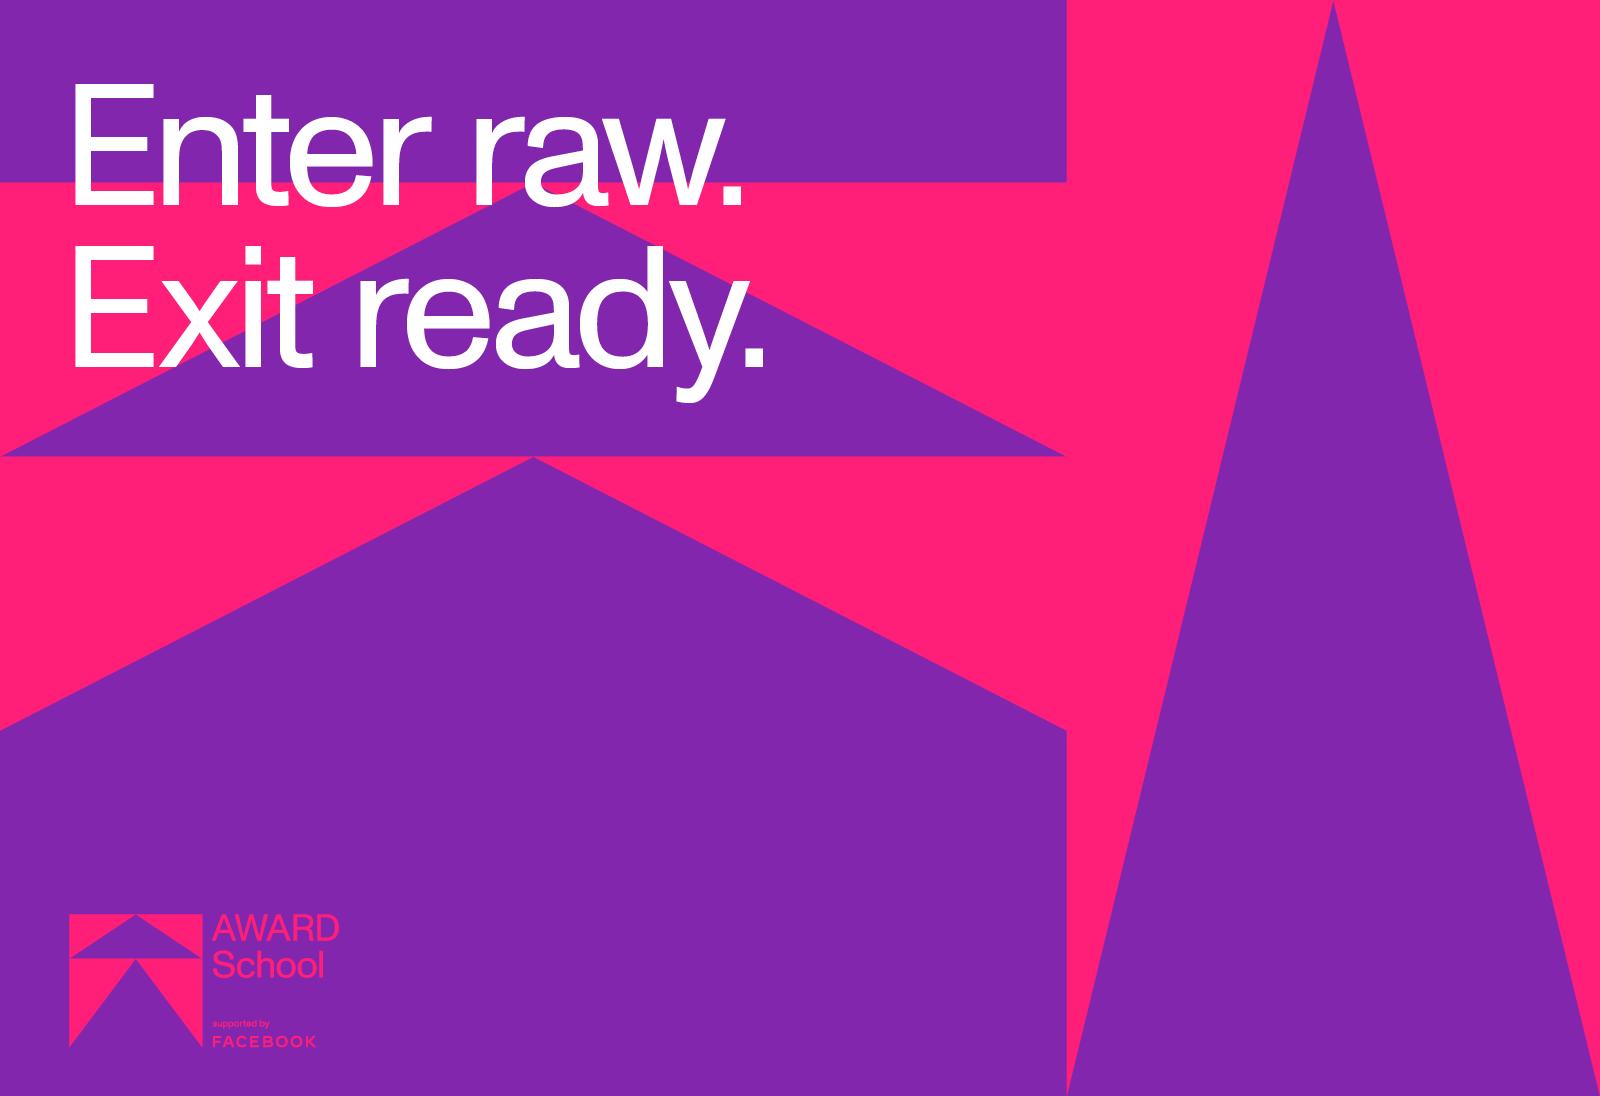 Enter Raw, Exit Ready: AWARD School kicks off its 2021 enrolment campaign